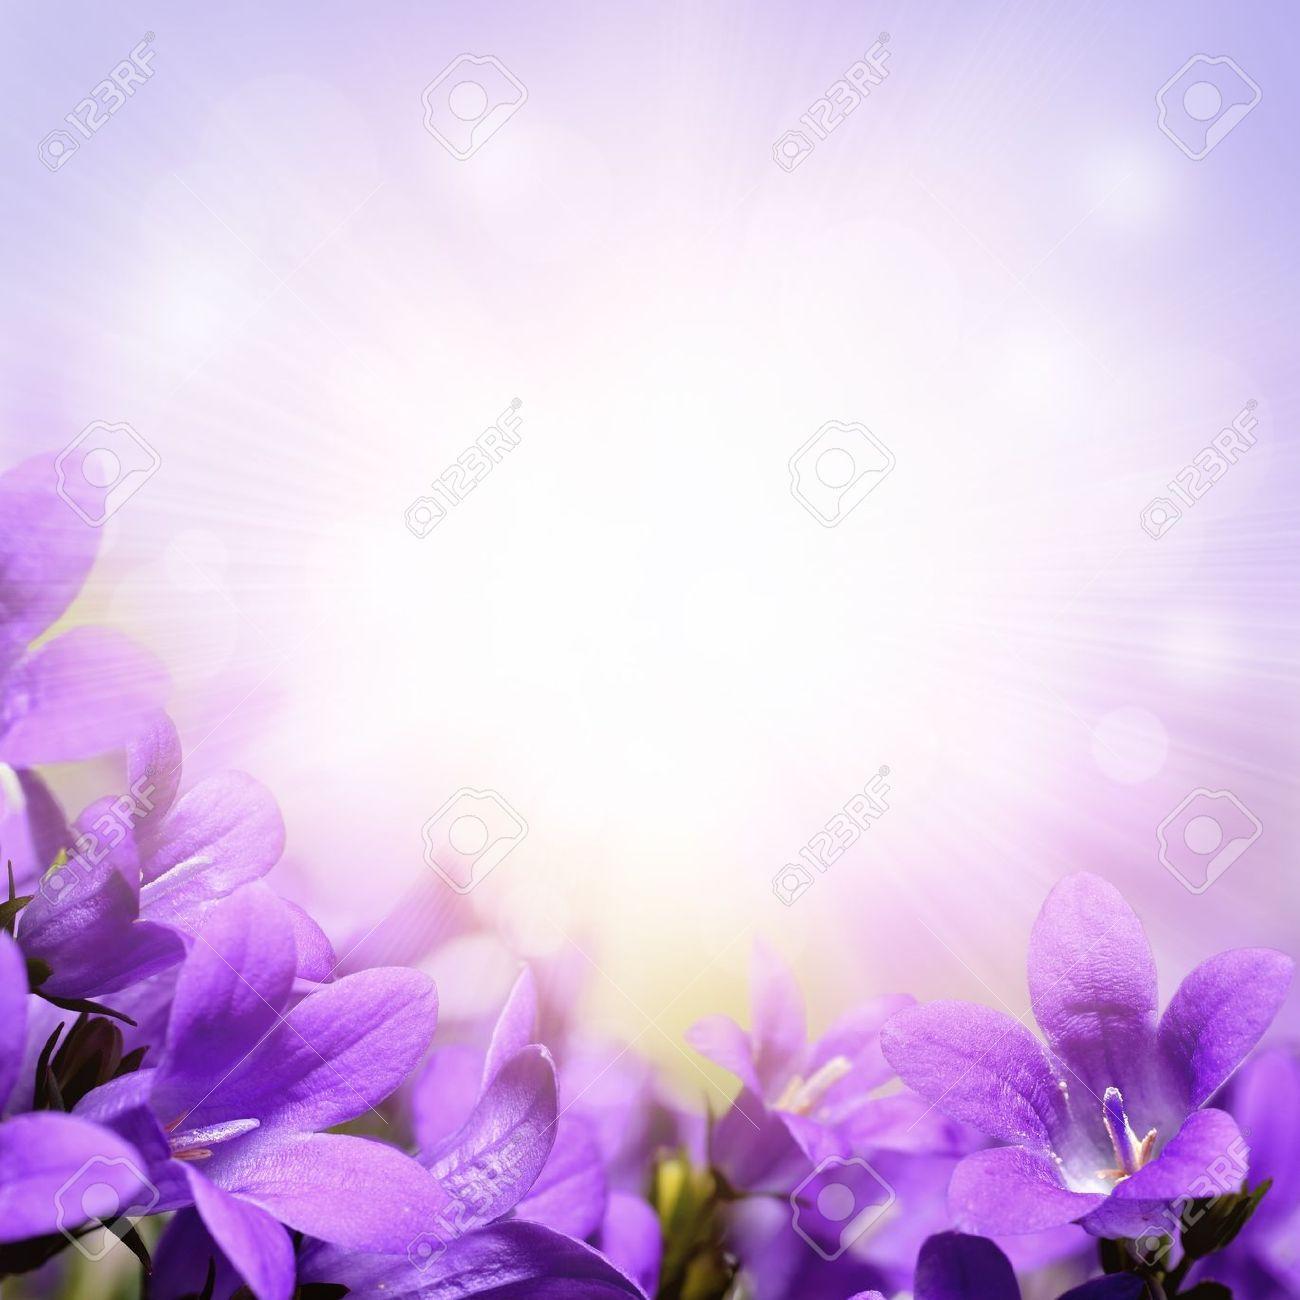 Lavender Background Wedding -Wedding Invitation Border